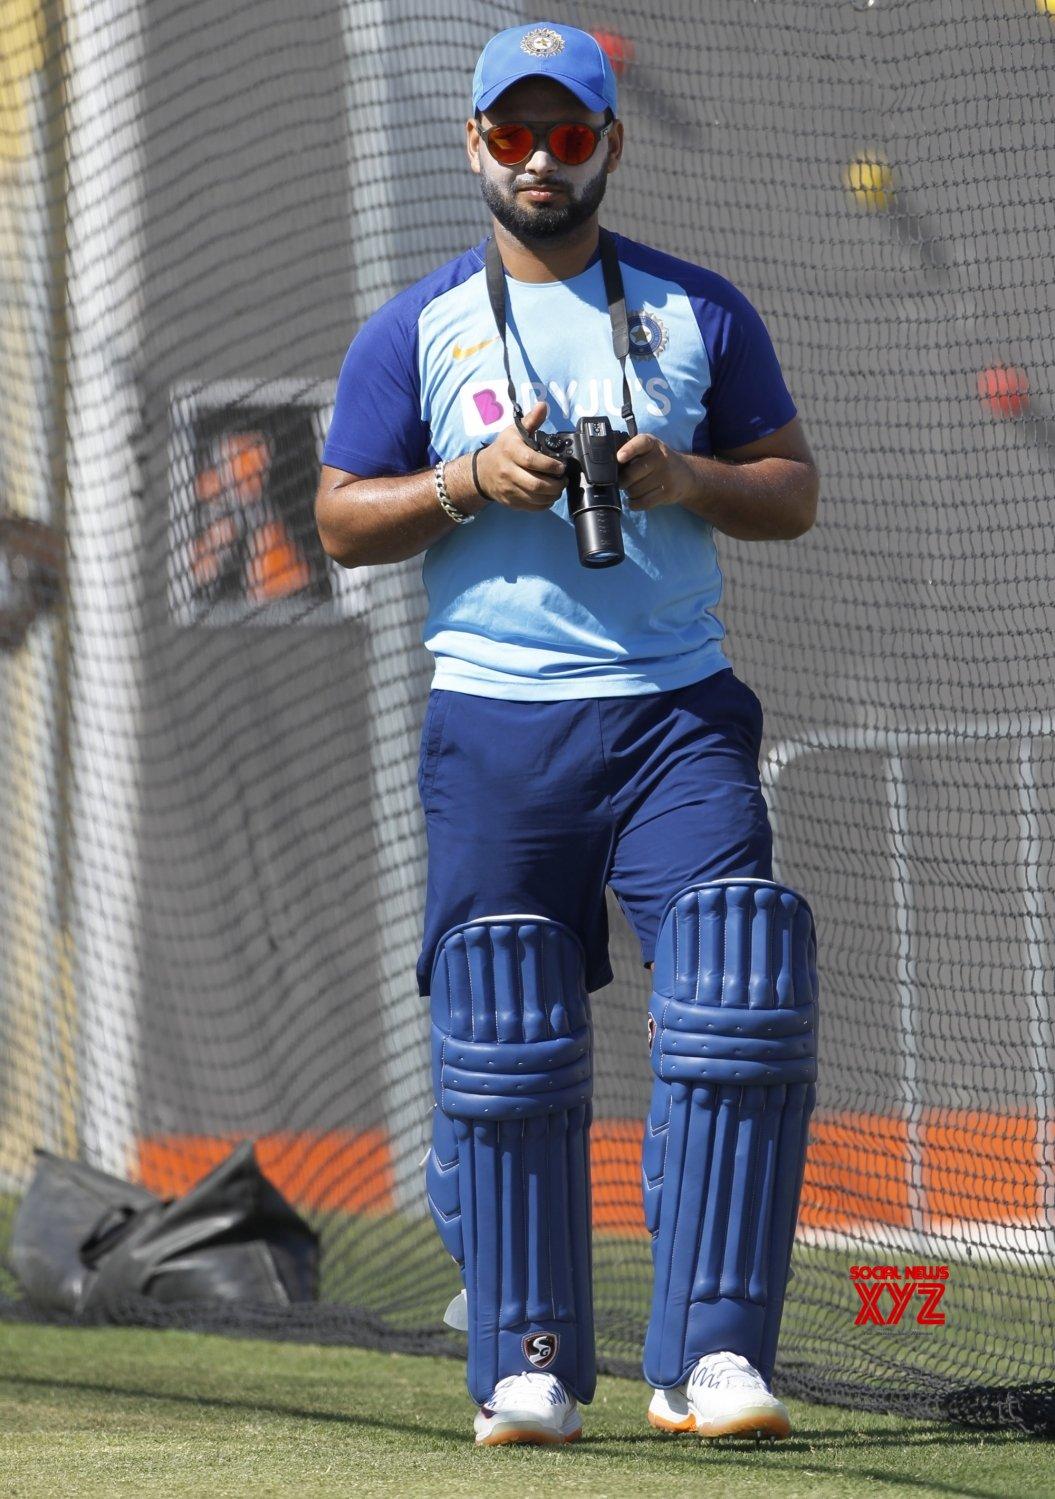 Tauranga (New Zealand): 3rd ODI - India Vs New Zealand - India practice session #Gallery